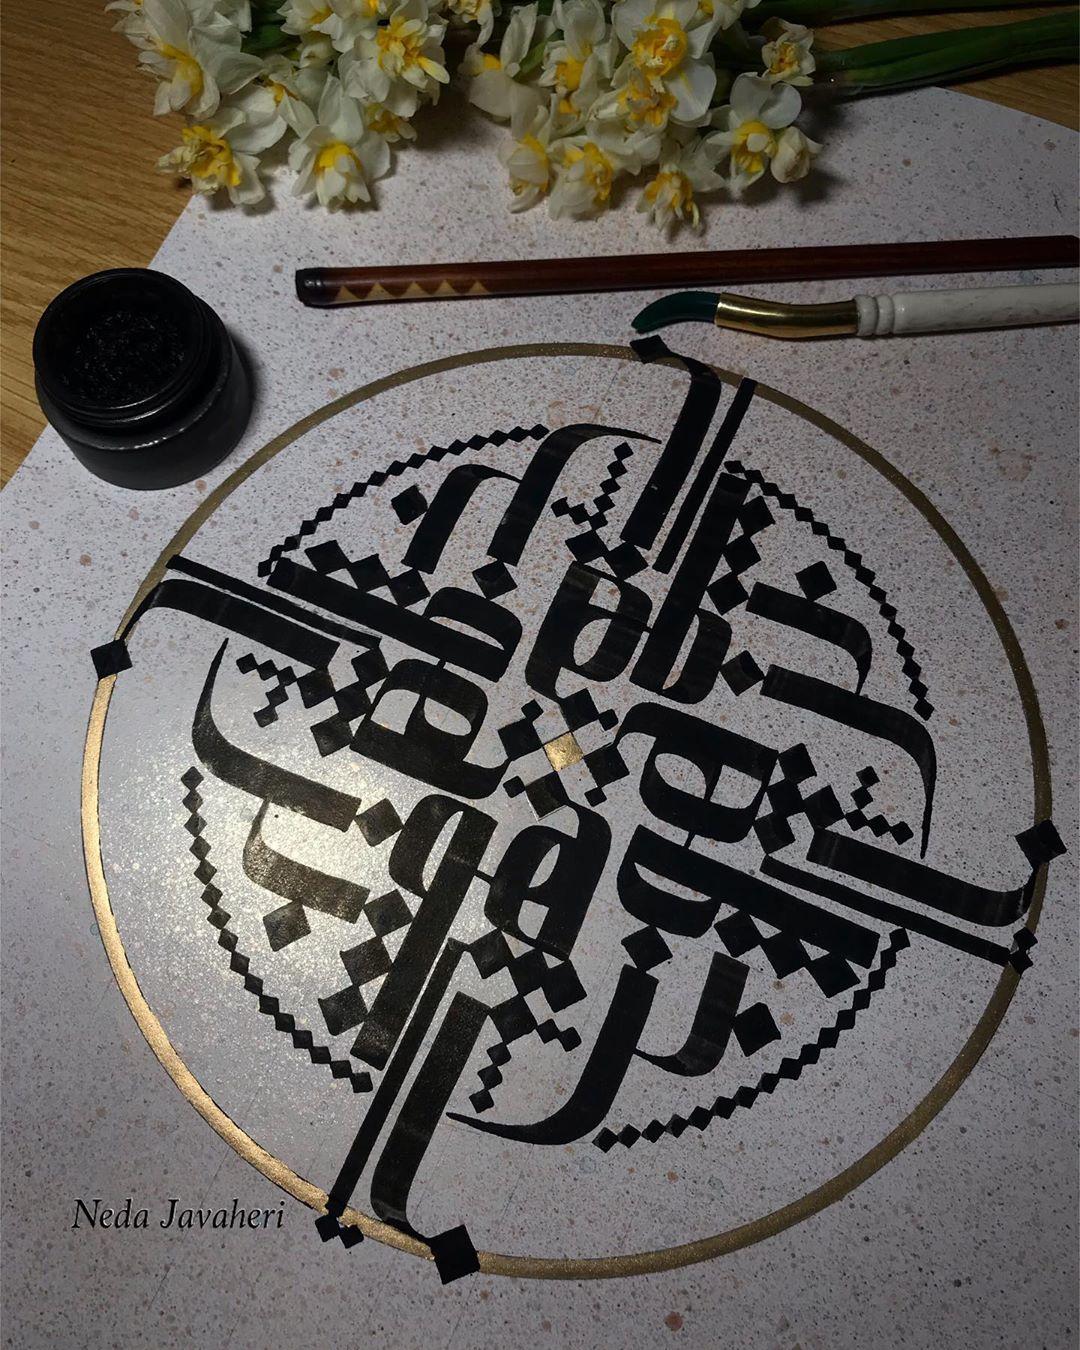 Karya Kaligrafi  از حرم لبیک گویان میروم  جذبهٔ کویی  مرا دیوانه کرد واقف از میخانه و مسجد نیَم …- Ne Javaher